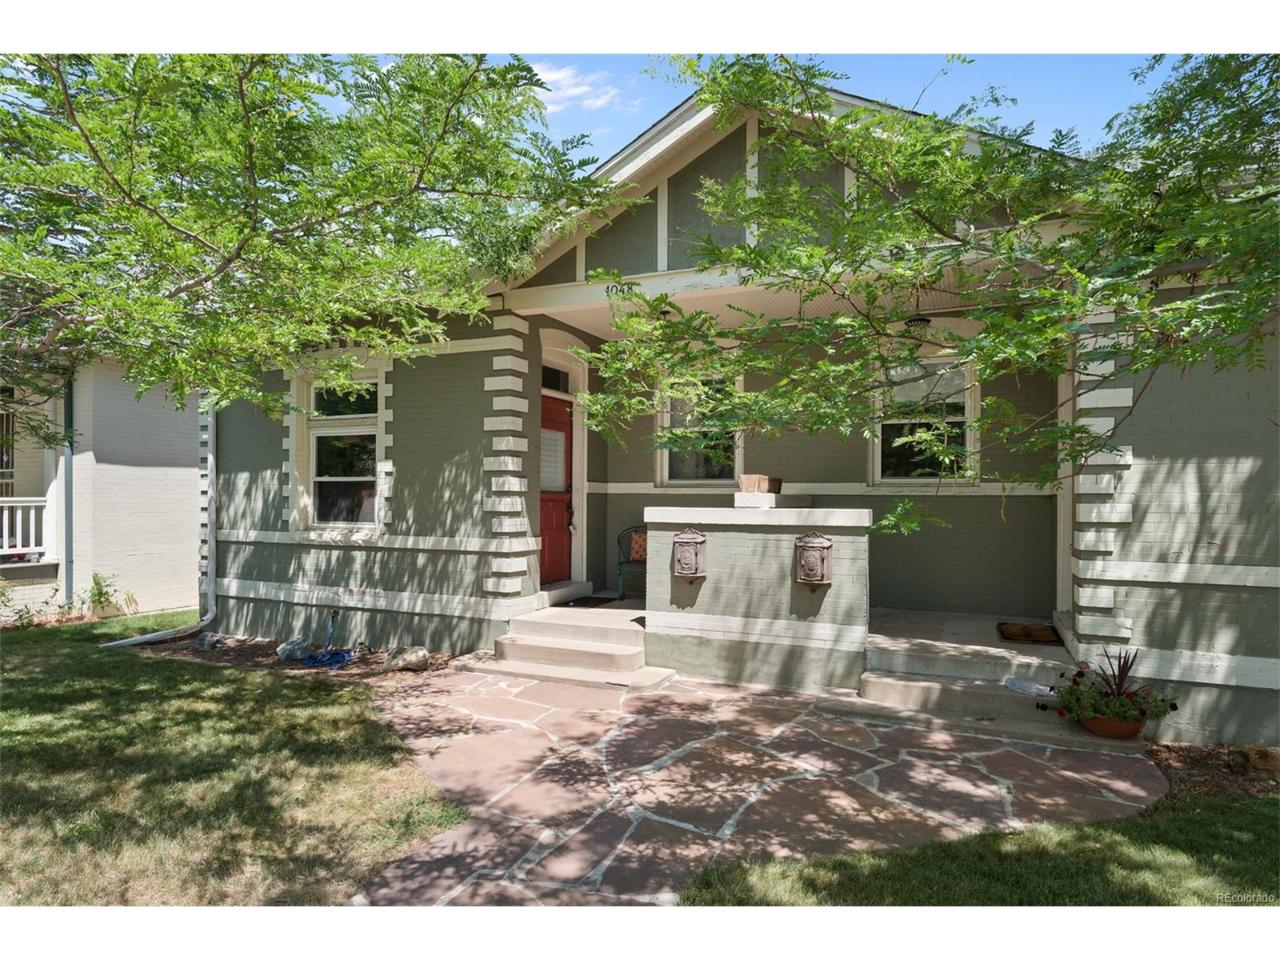 1048 S Washington Street, Denver, CO 80209 (MLS #4549437) :: 8z Real Estate